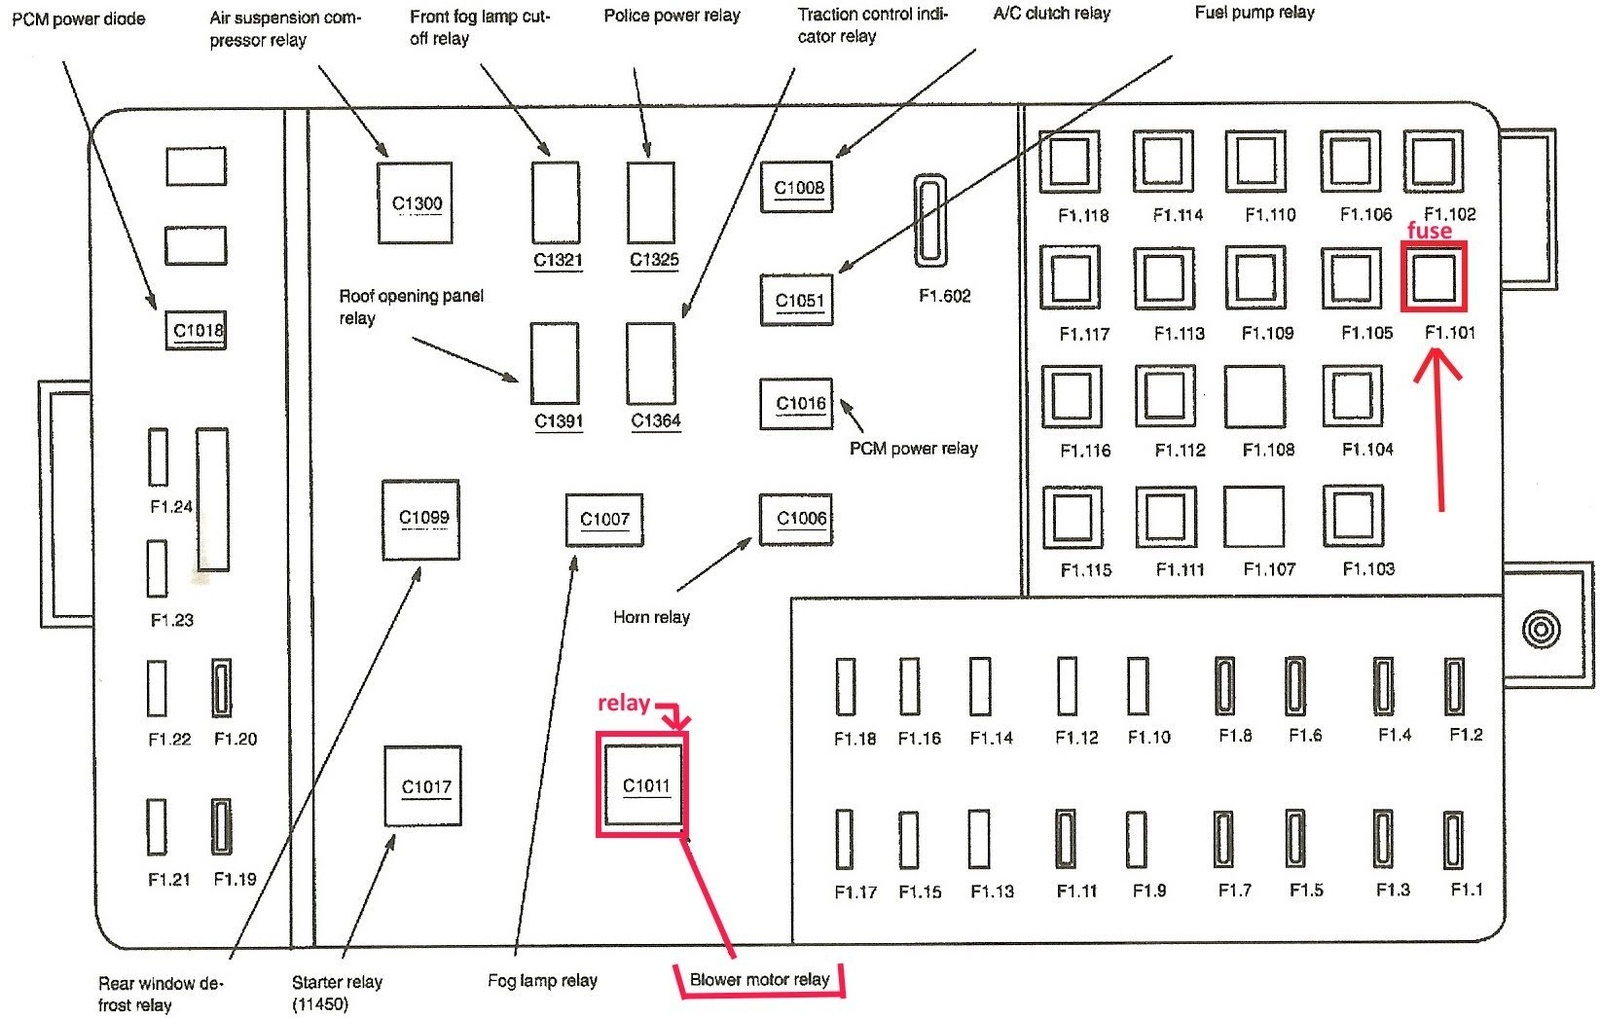 2016 Isuzu Nprtrail Wiring Diagram 34 Images Dmax Fuse Box Pic 4554908895057446462 1600x1200resize6652c423 1999 Npr